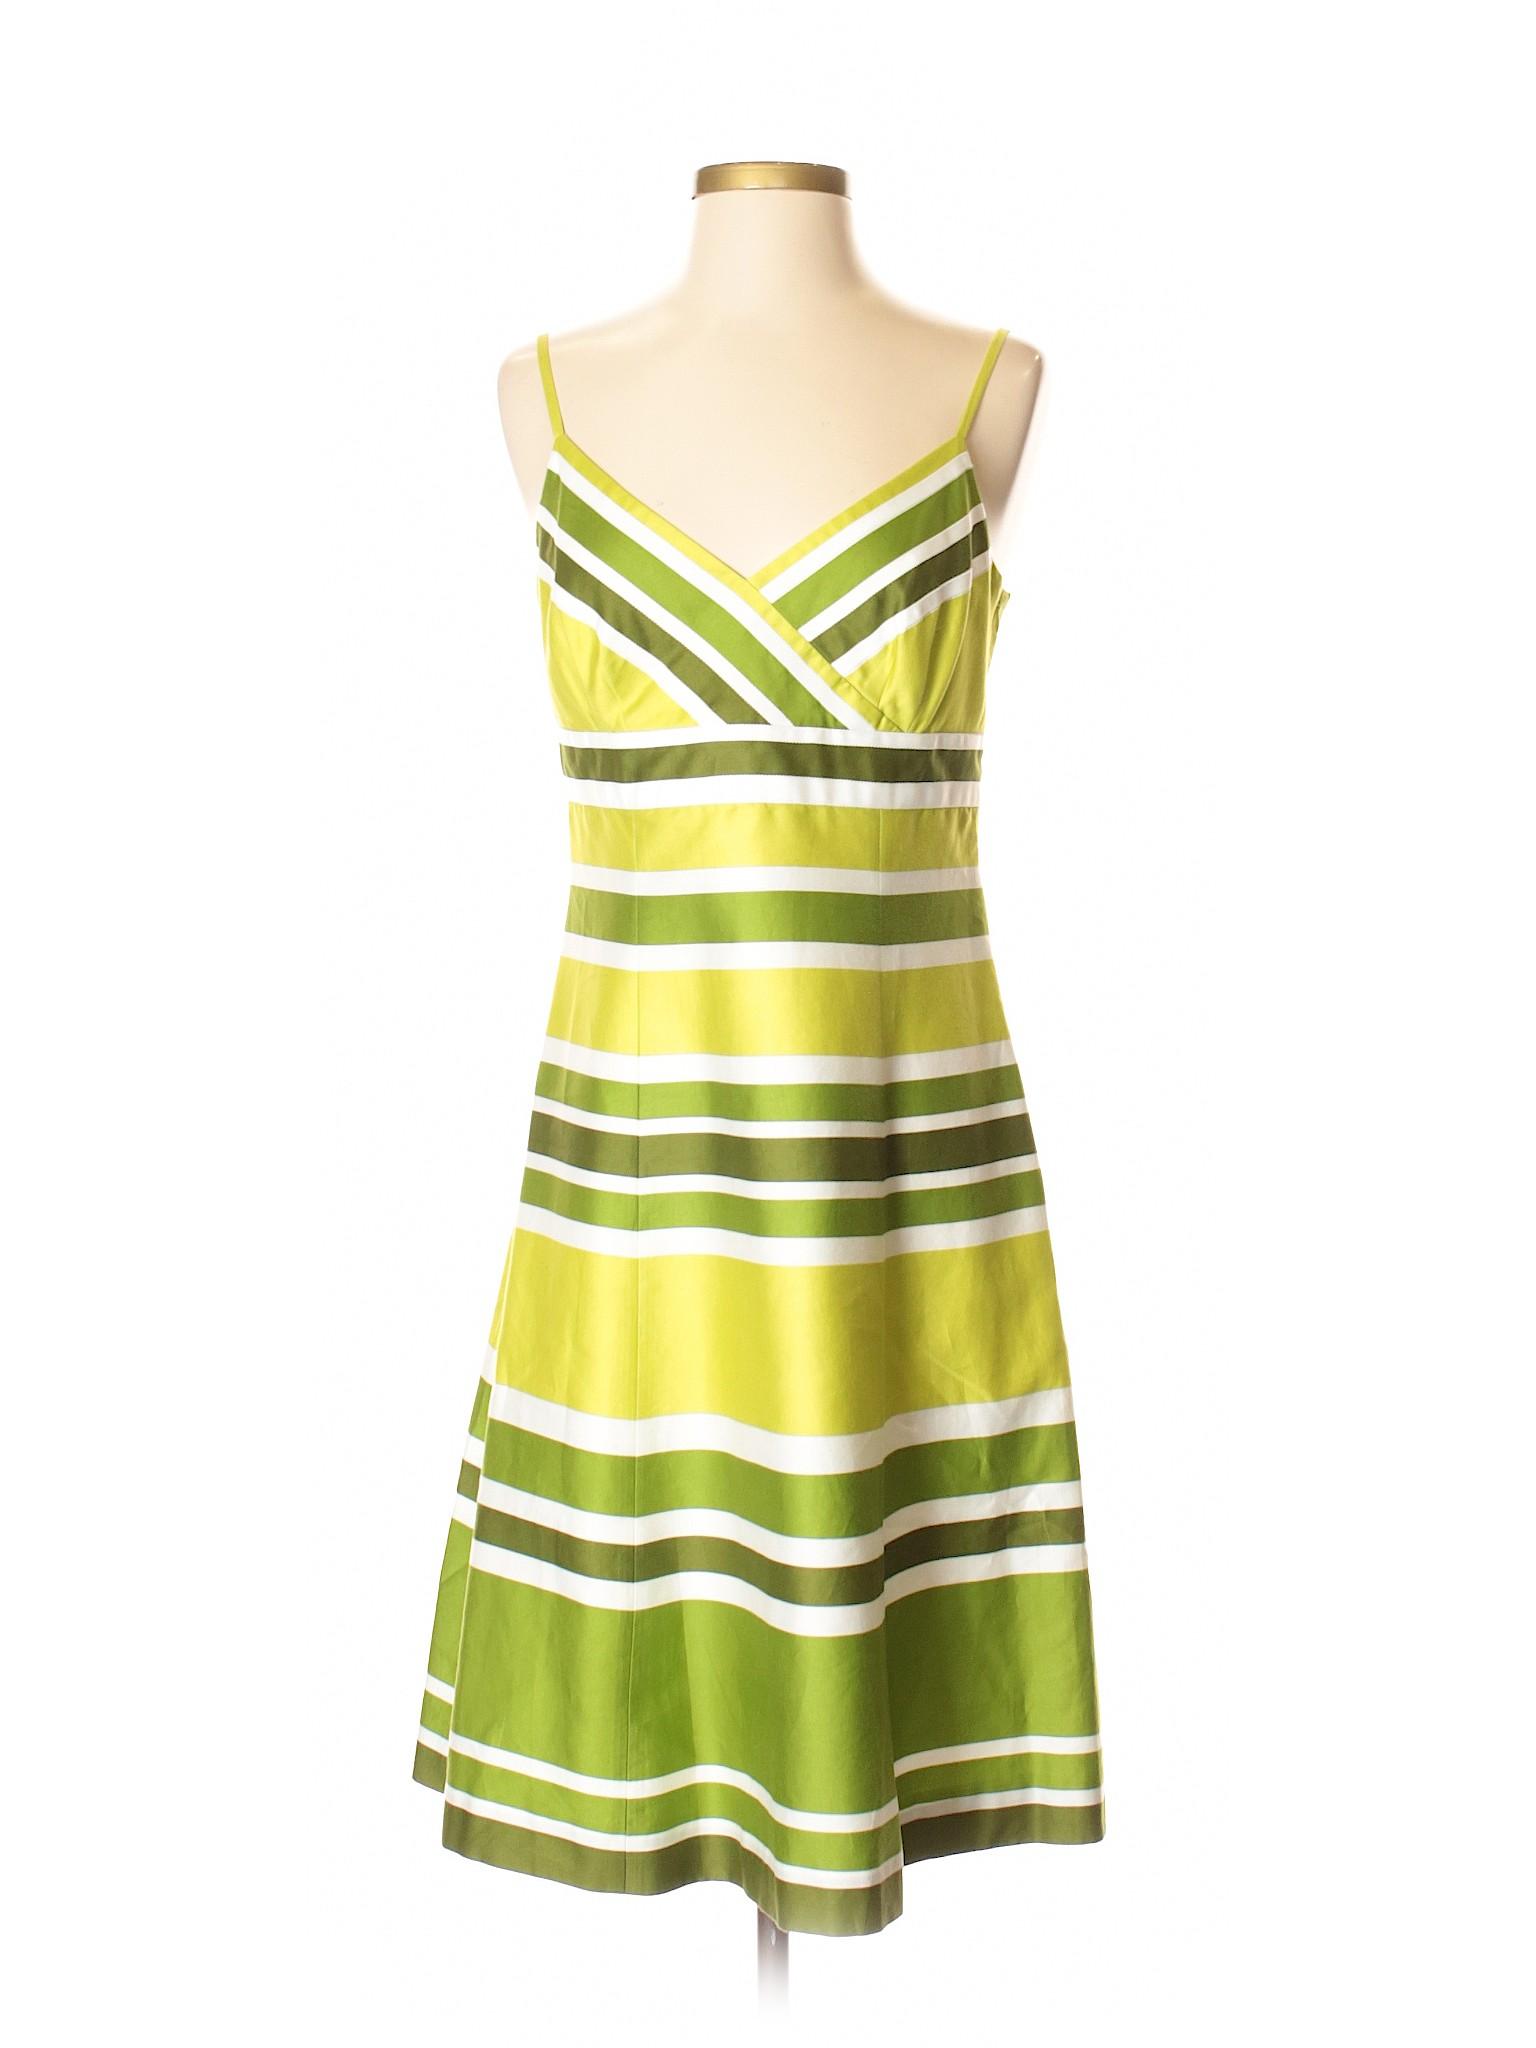 Boutique Dress Casual Taylor winter LOFT Ann BZxwTOrqB